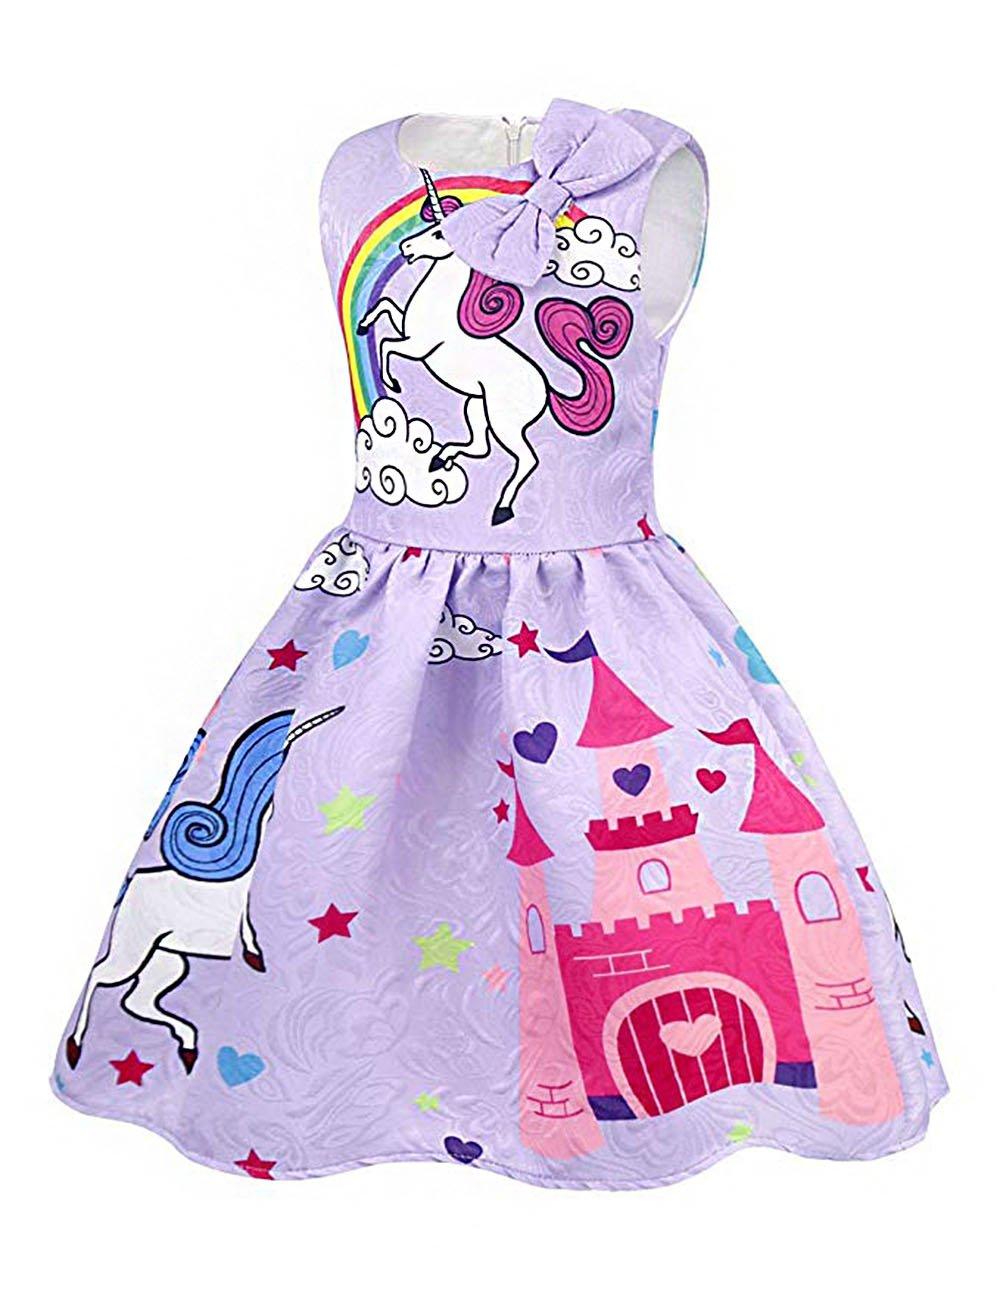 KYMIDY Summer Girls Unicorn Dress Rainbow Toddler Pleated Casual Dress